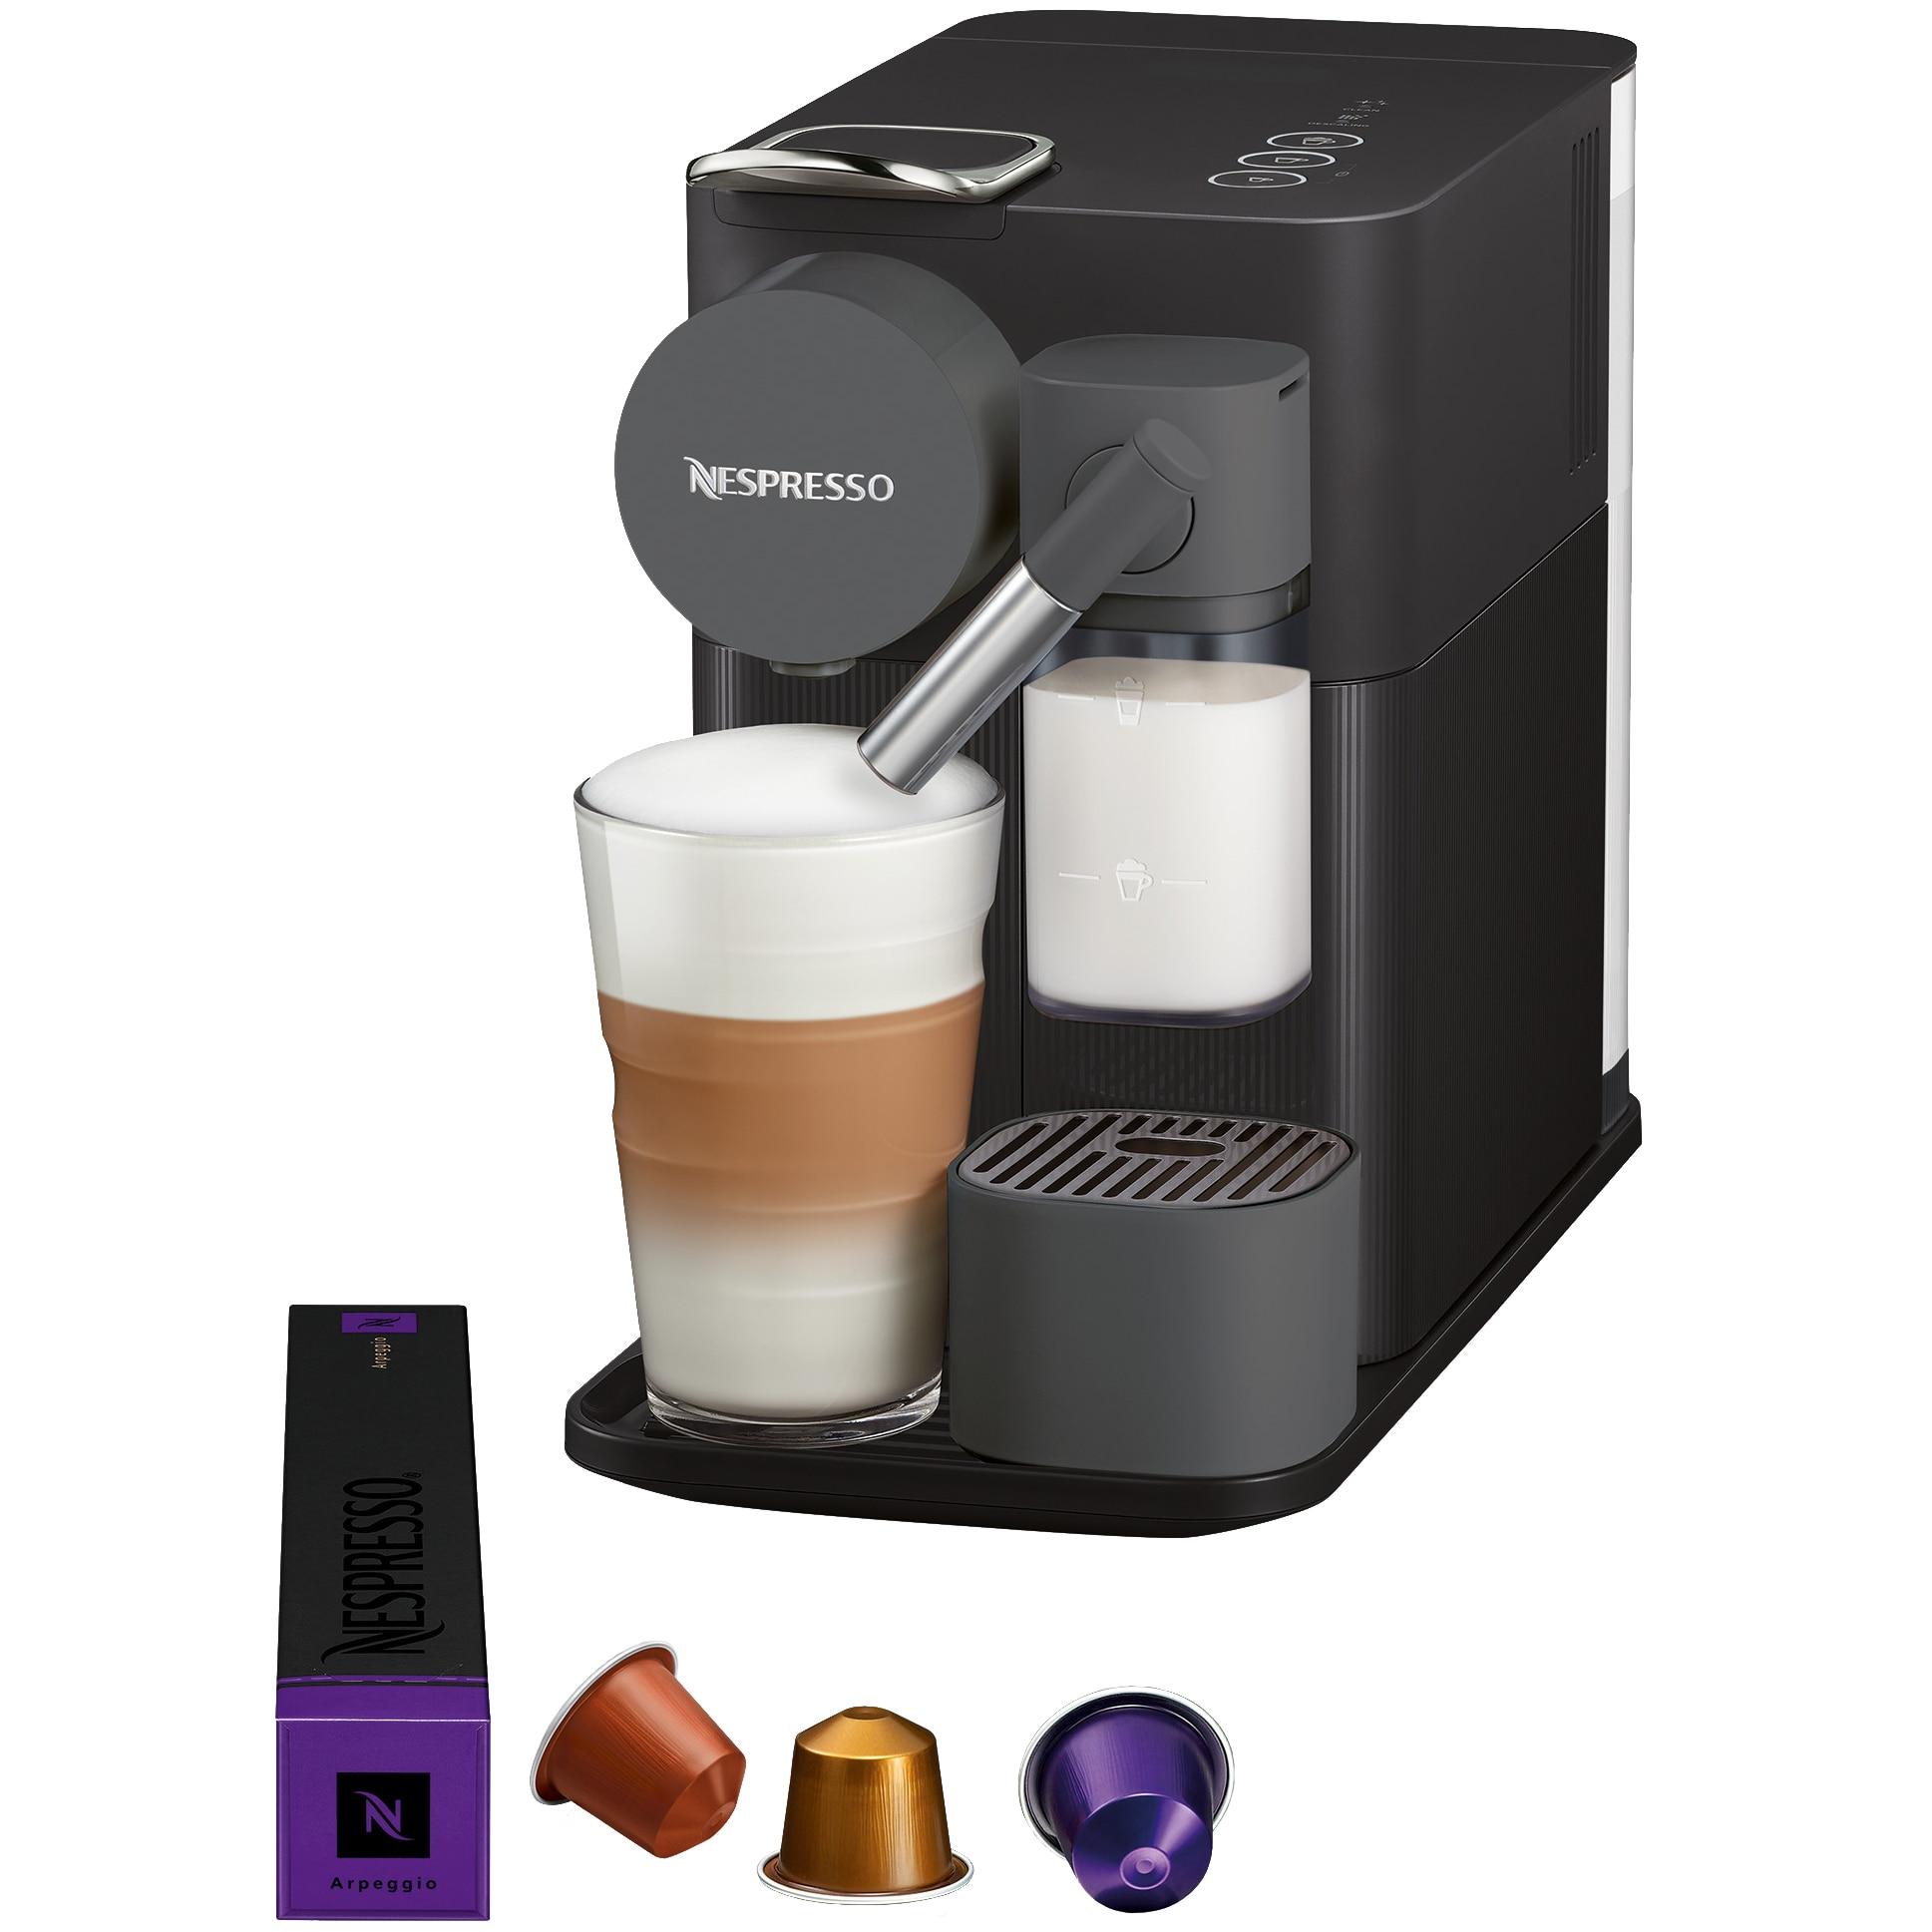 Fotografie Espressor Nespresso EN-500.B-RO Lattissima One, 19 bari, 1400 W, 1 l, Negru + 14 capsule cadou